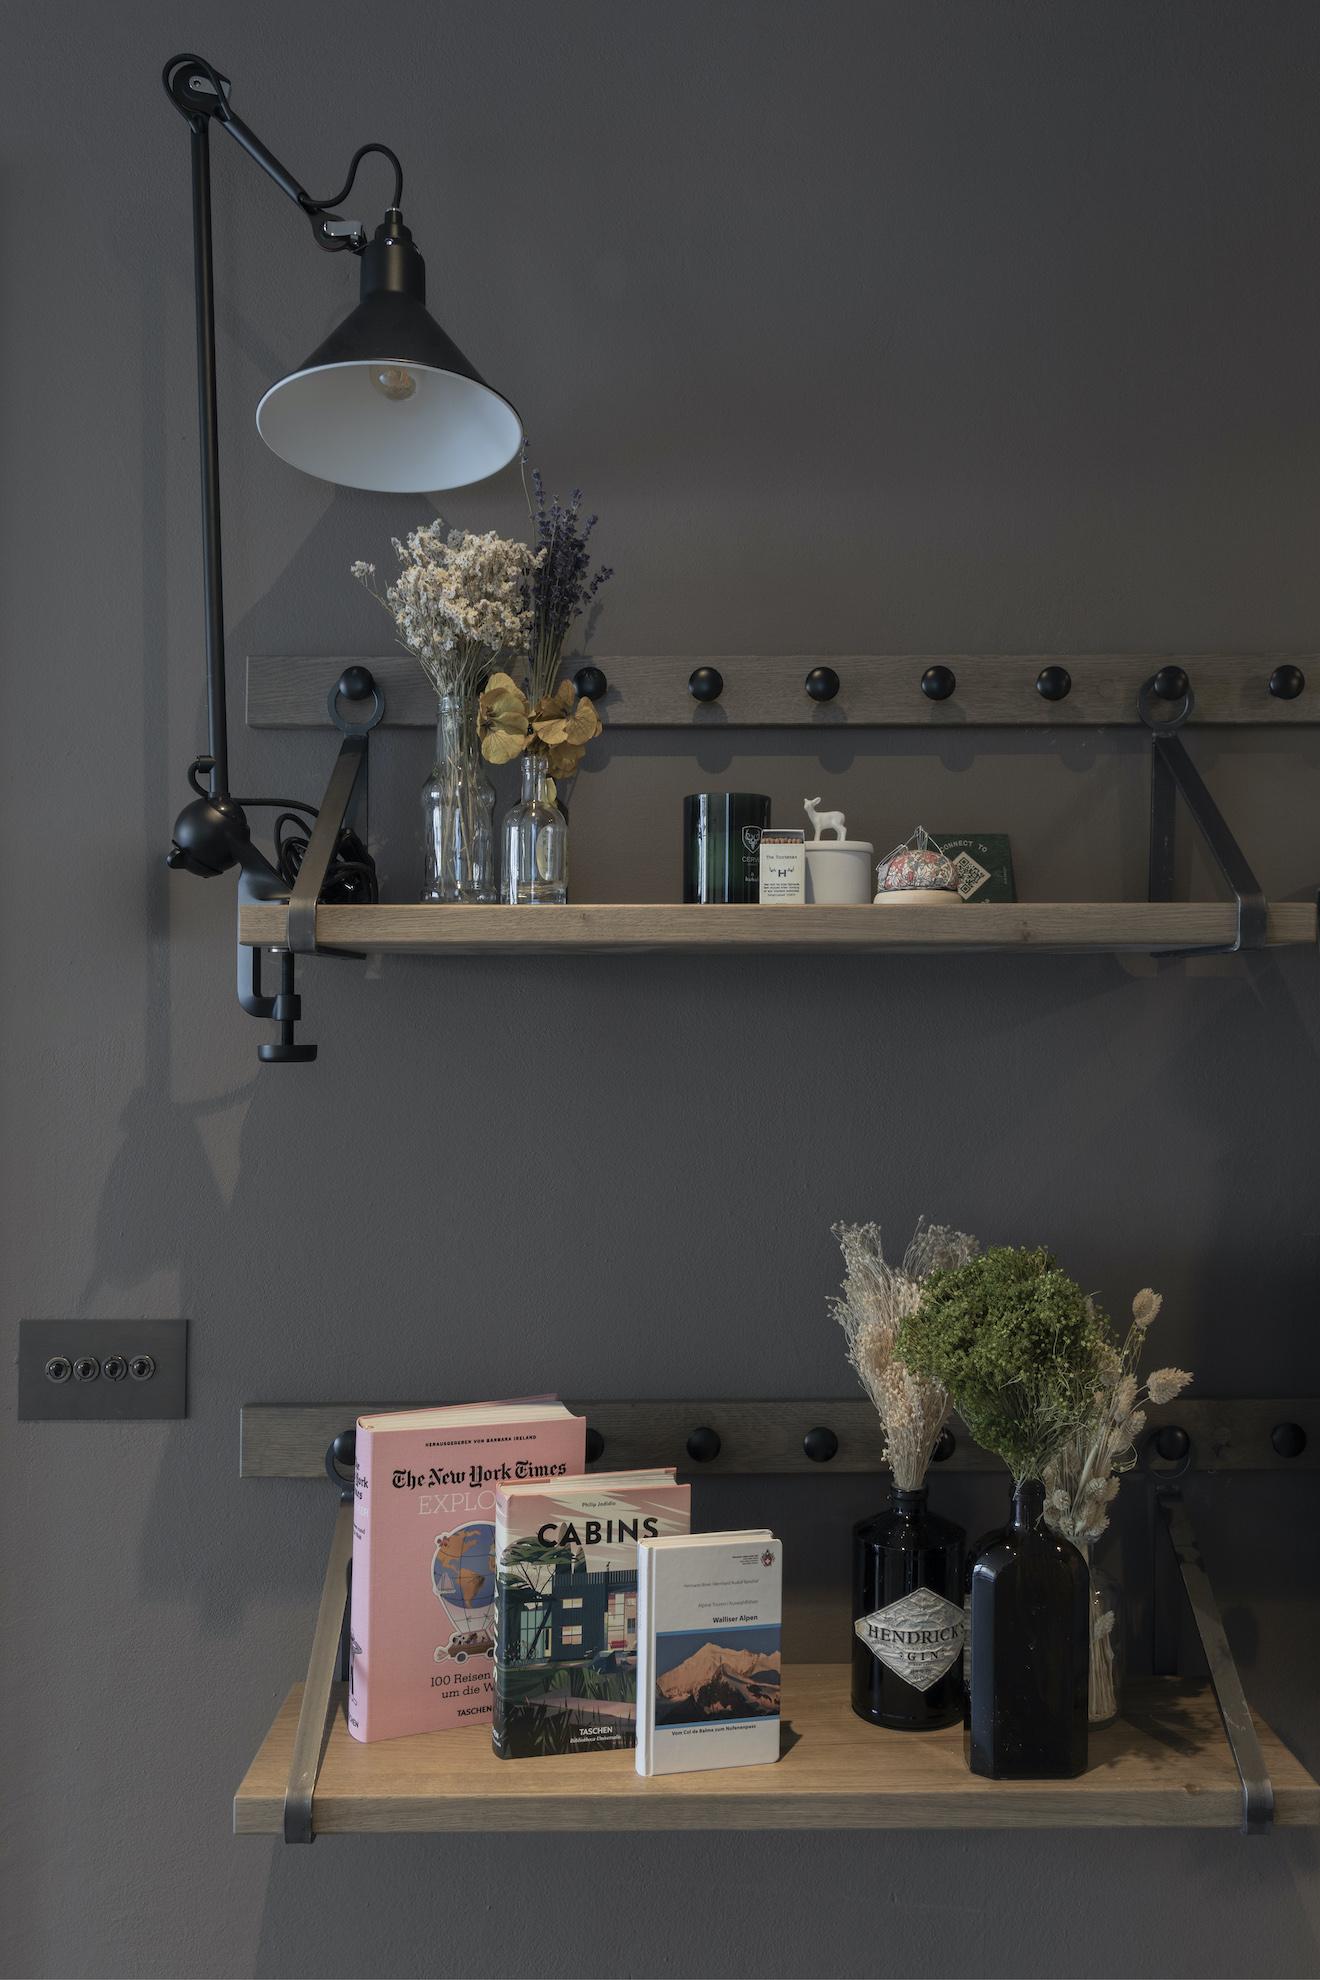 Bookshelf with decoration